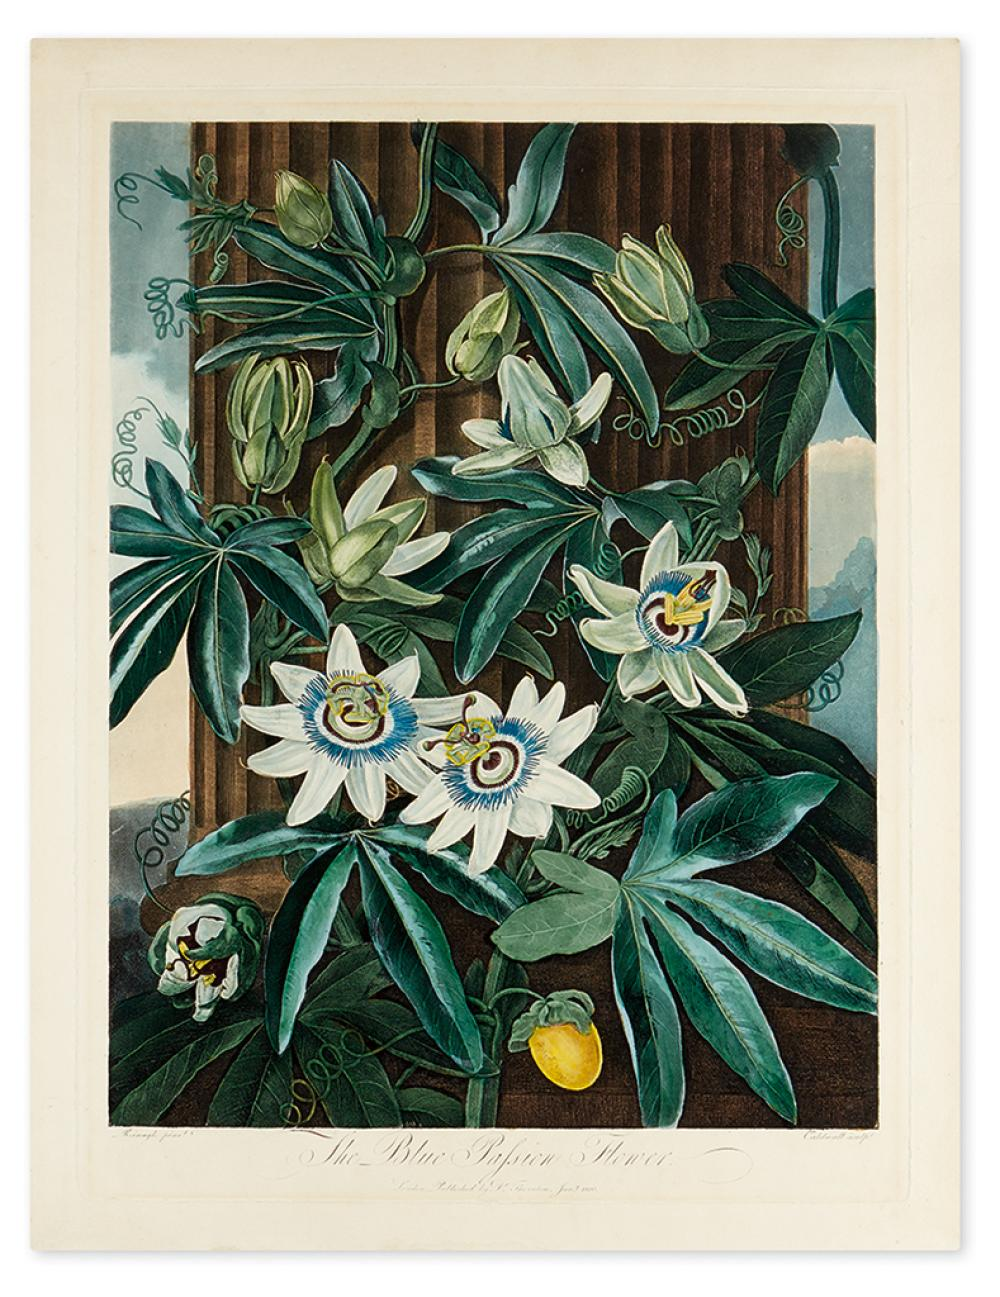 THORNTON, ROBERT JOHN. The Blue Passion Flower.